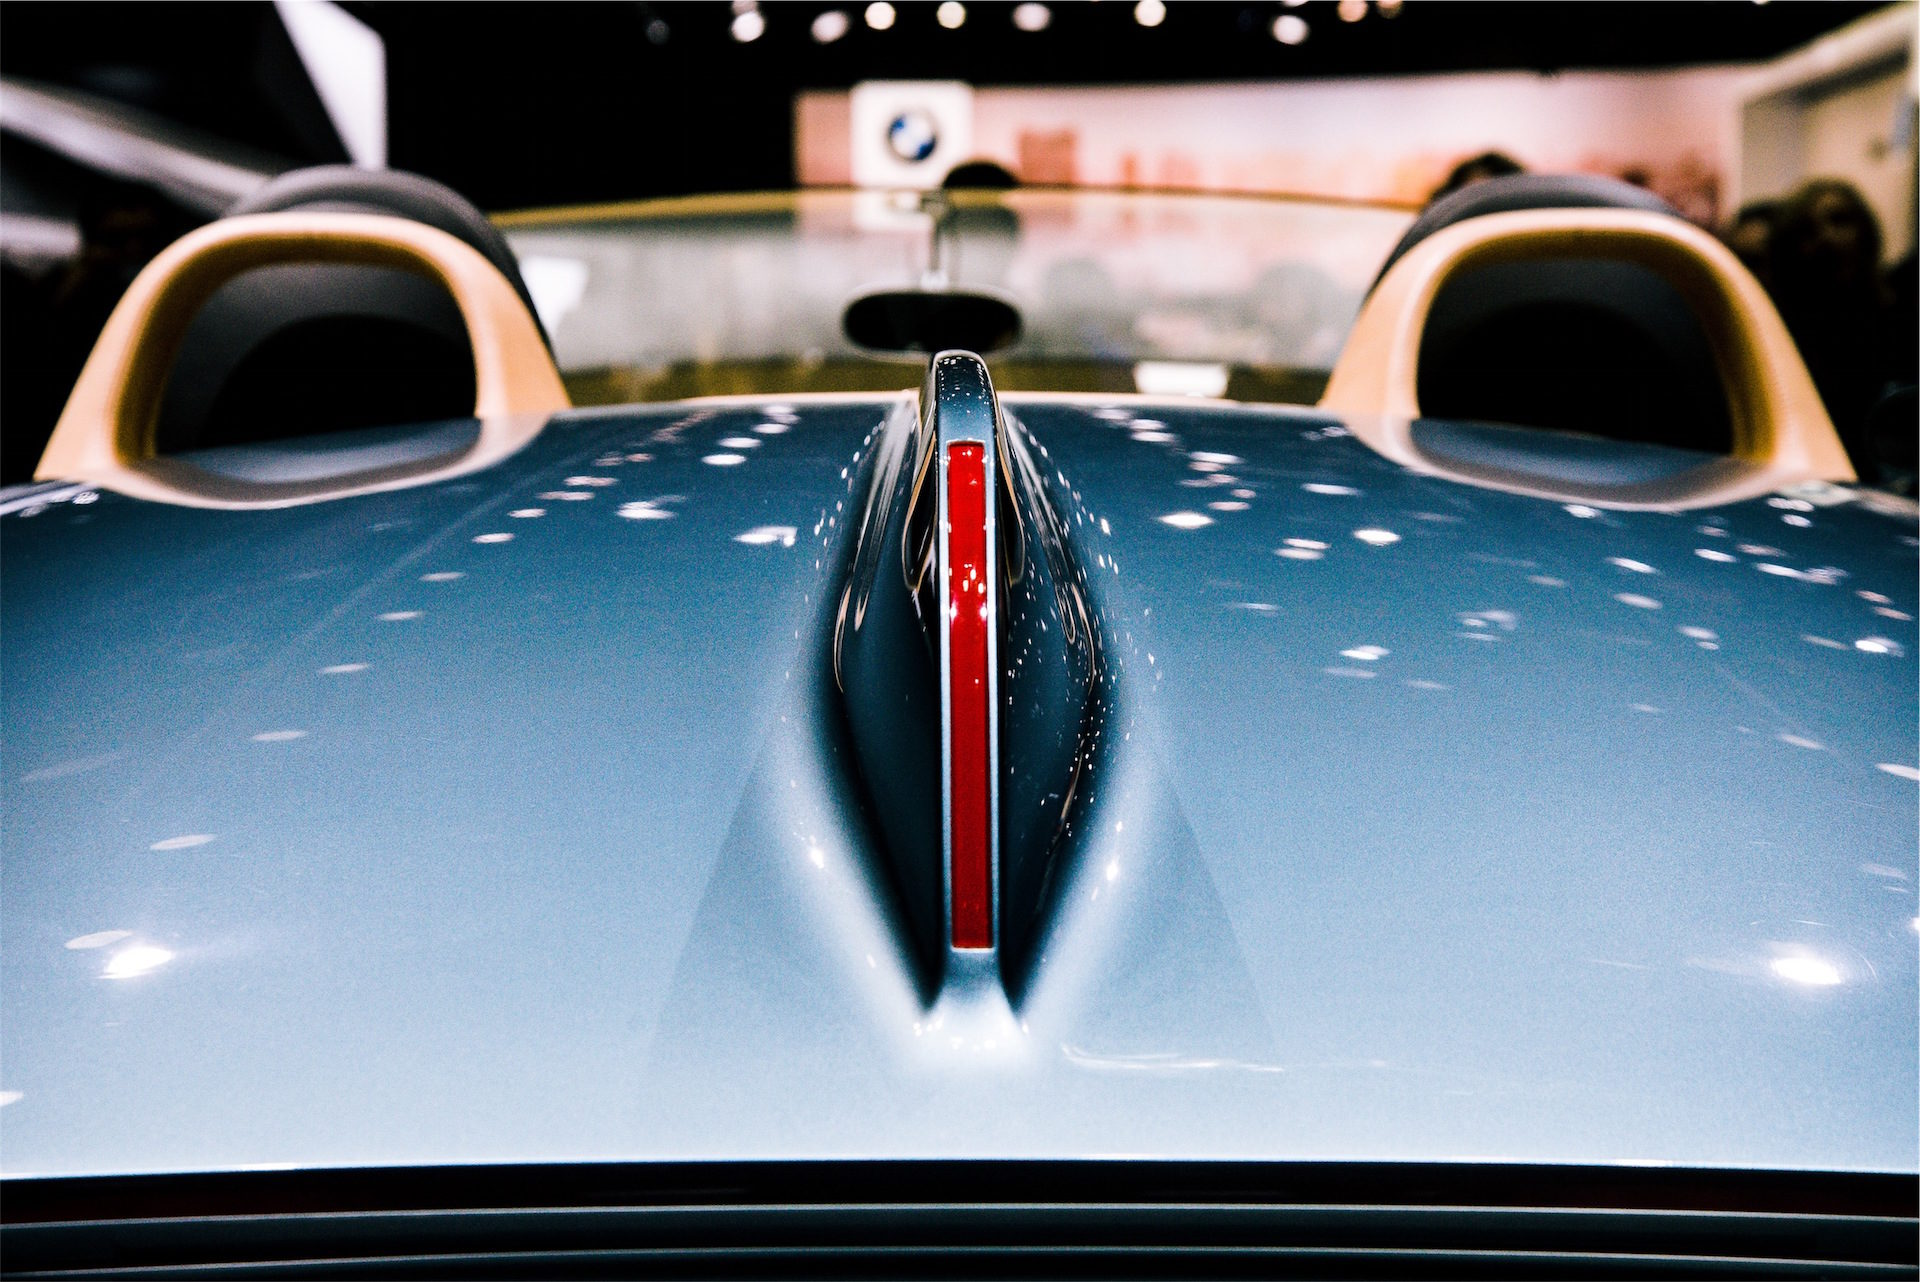 voiture, sport, convertible, luxe, arrière - Fonds d'écran HD - Professor-falken.com